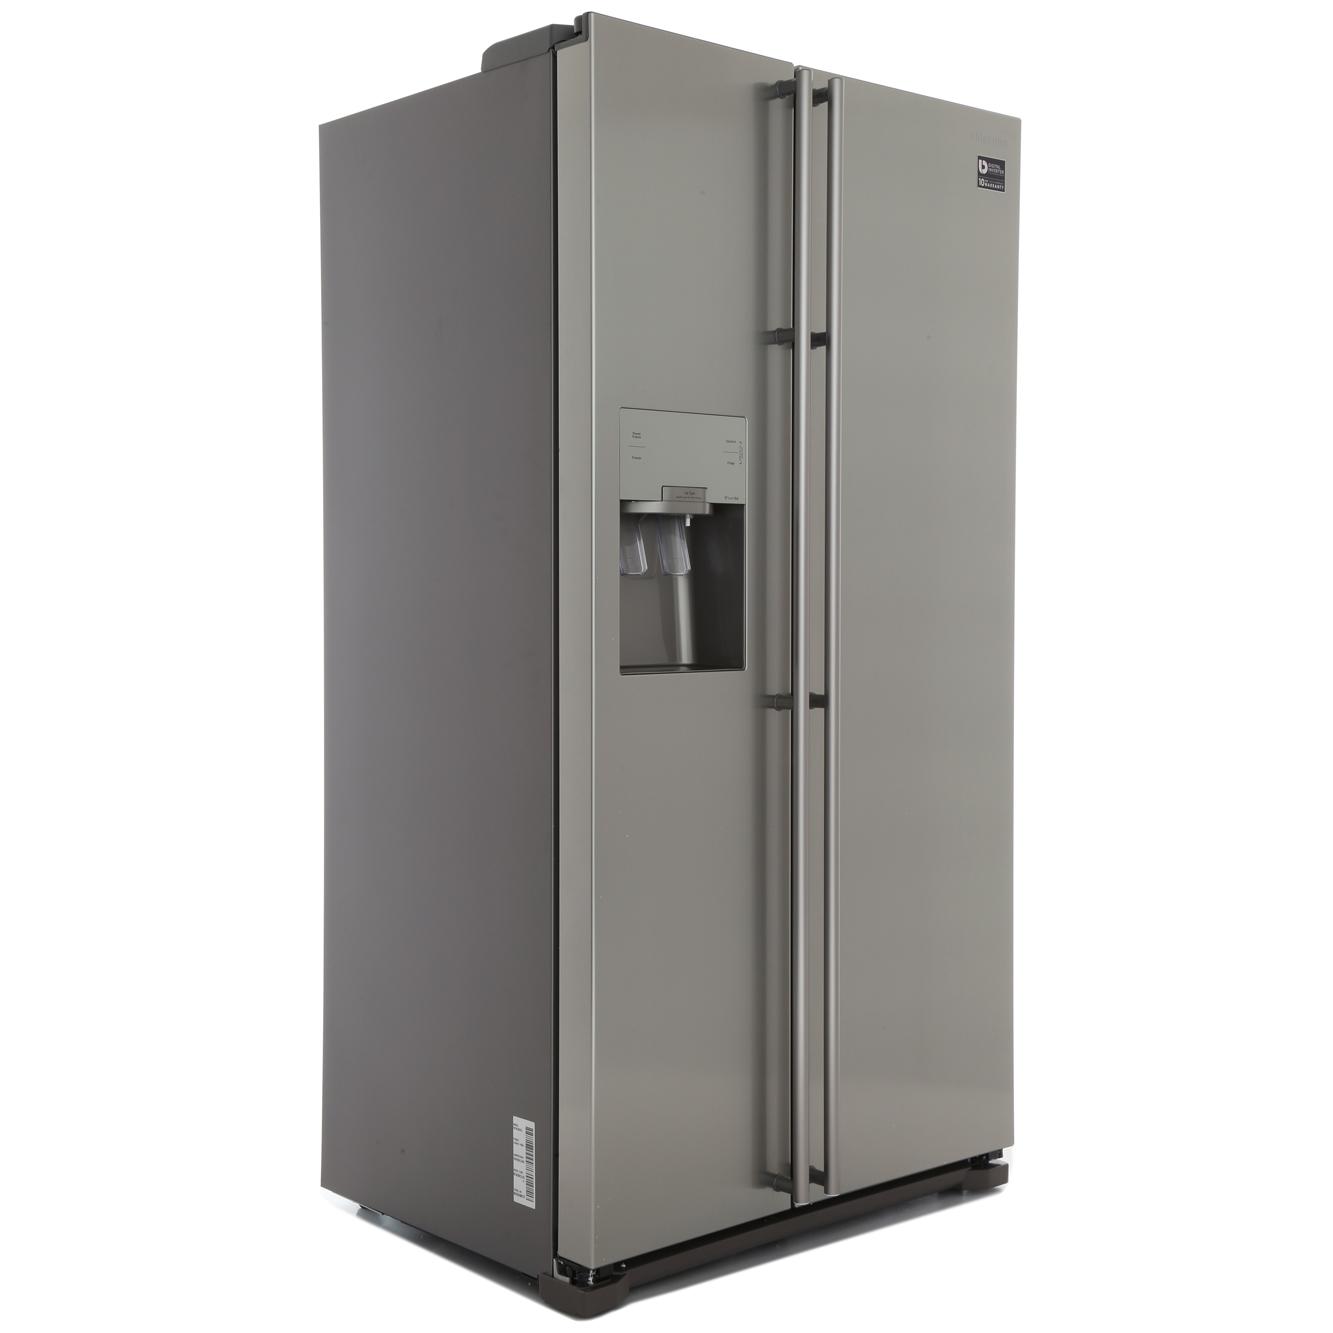 samsung fridge freezer. samsung h series rs7567bhcsl american fridge freezer